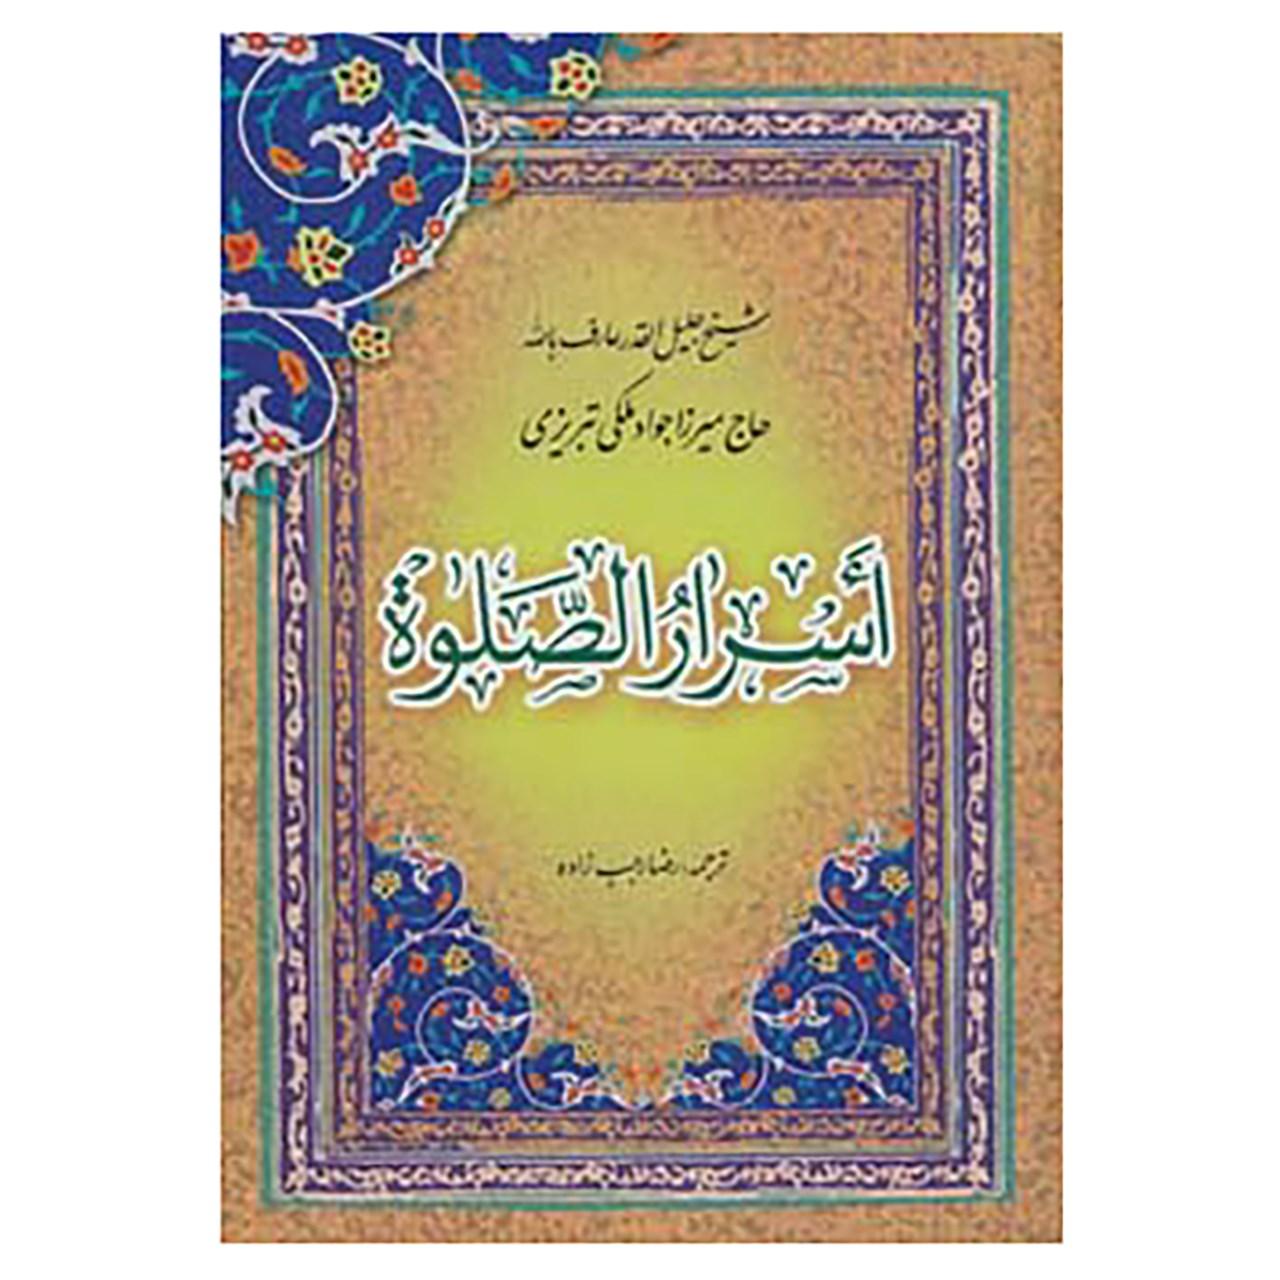 خرید                      کتاب اسرار الصلوة اثر جواد ملکی تبریزی